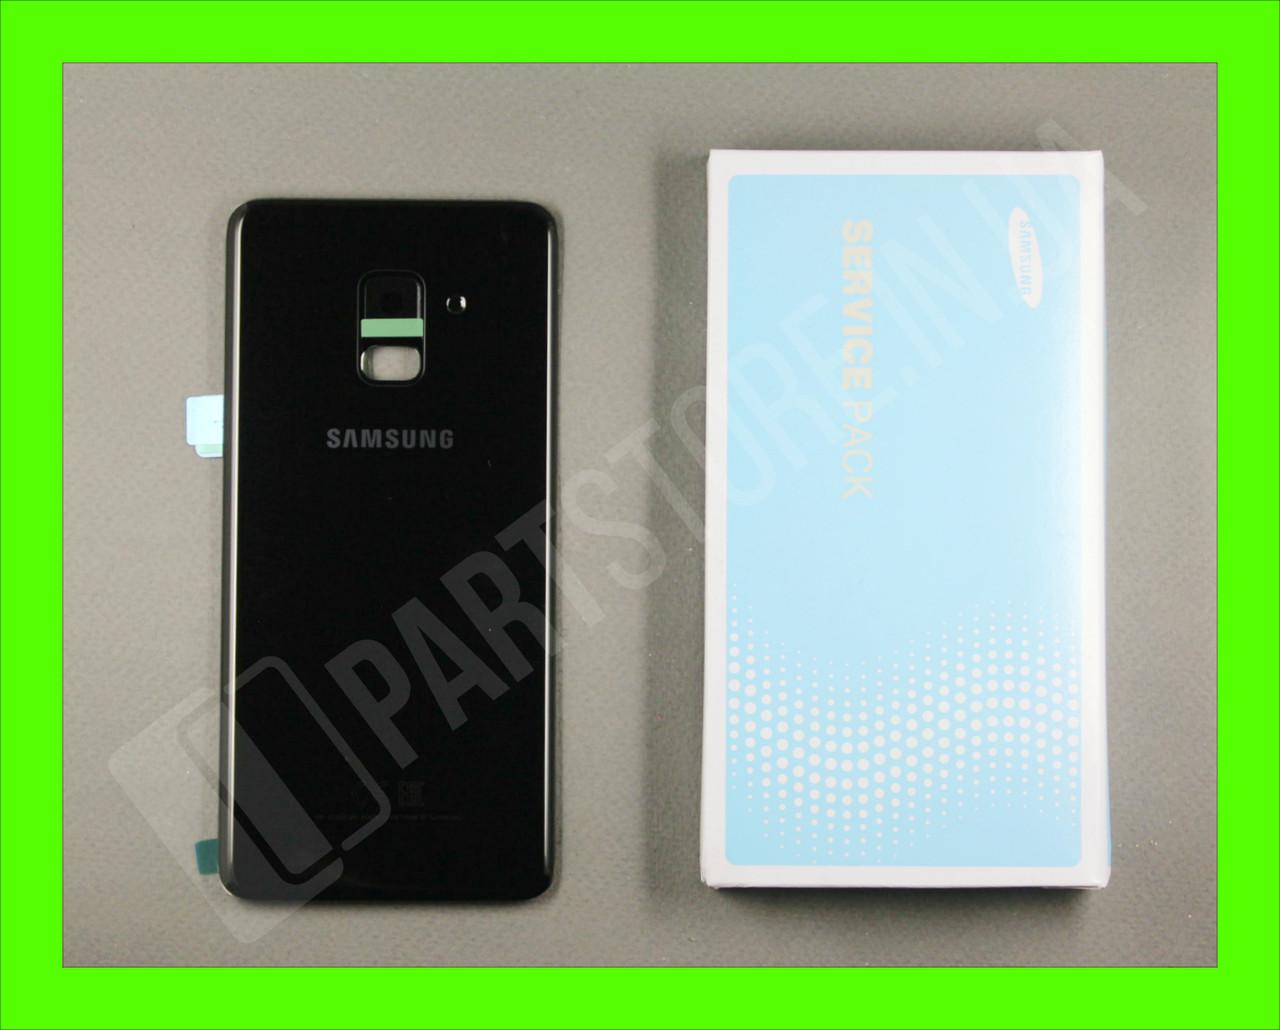 Cервисная оригинальная задняя Крышка Samsung A530 Black A8 2018 (GH82-15591A)